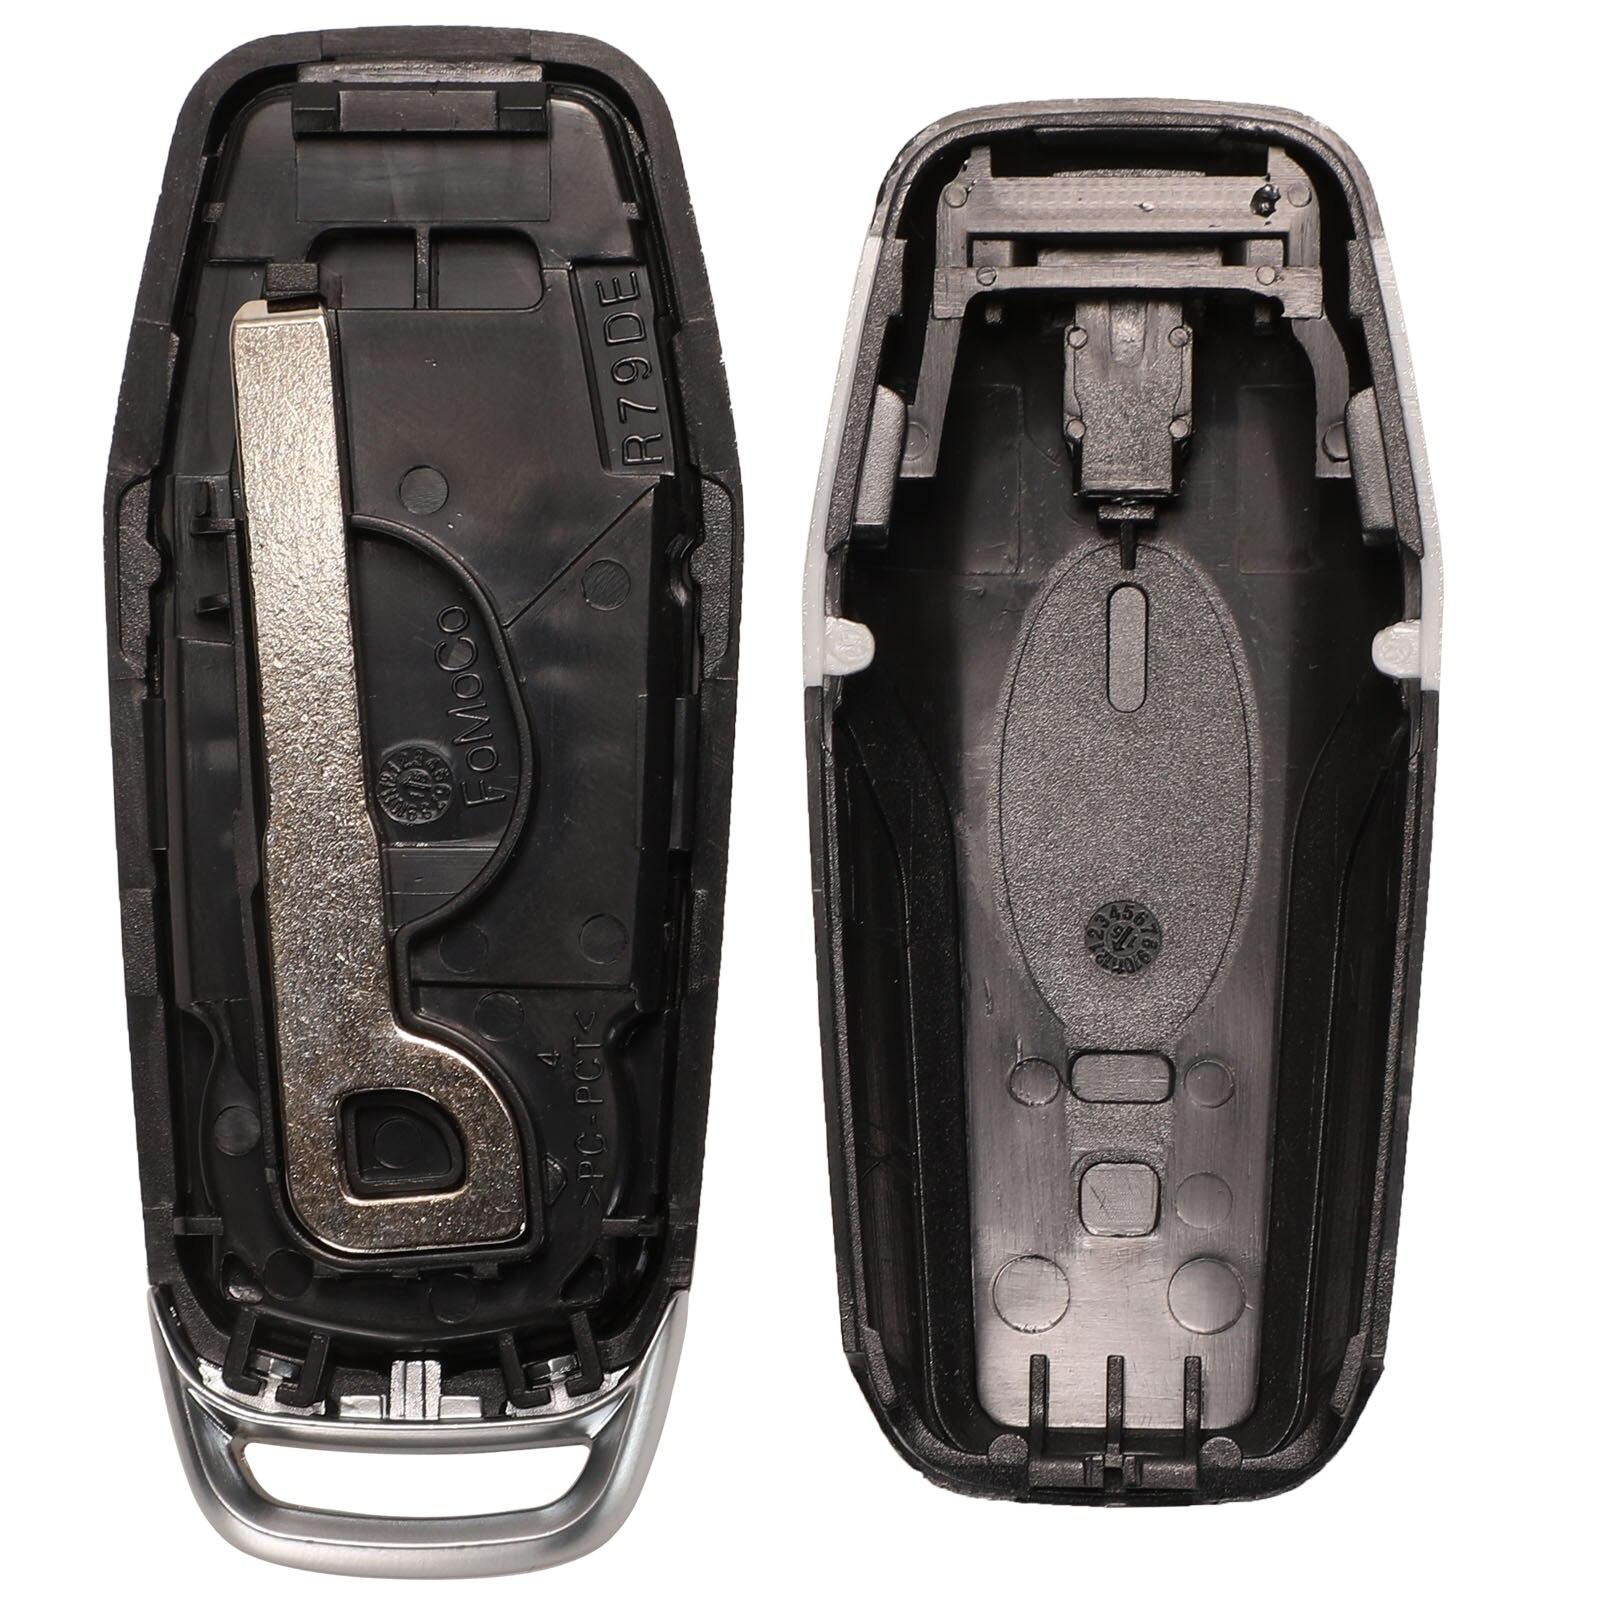 jingyuqin 3/4/5 Buttons Remote Car Key Shell For Ford Edge Explorer Fusion 2015 2016 2017 M3N-A2C31243300 Smart Key Fob